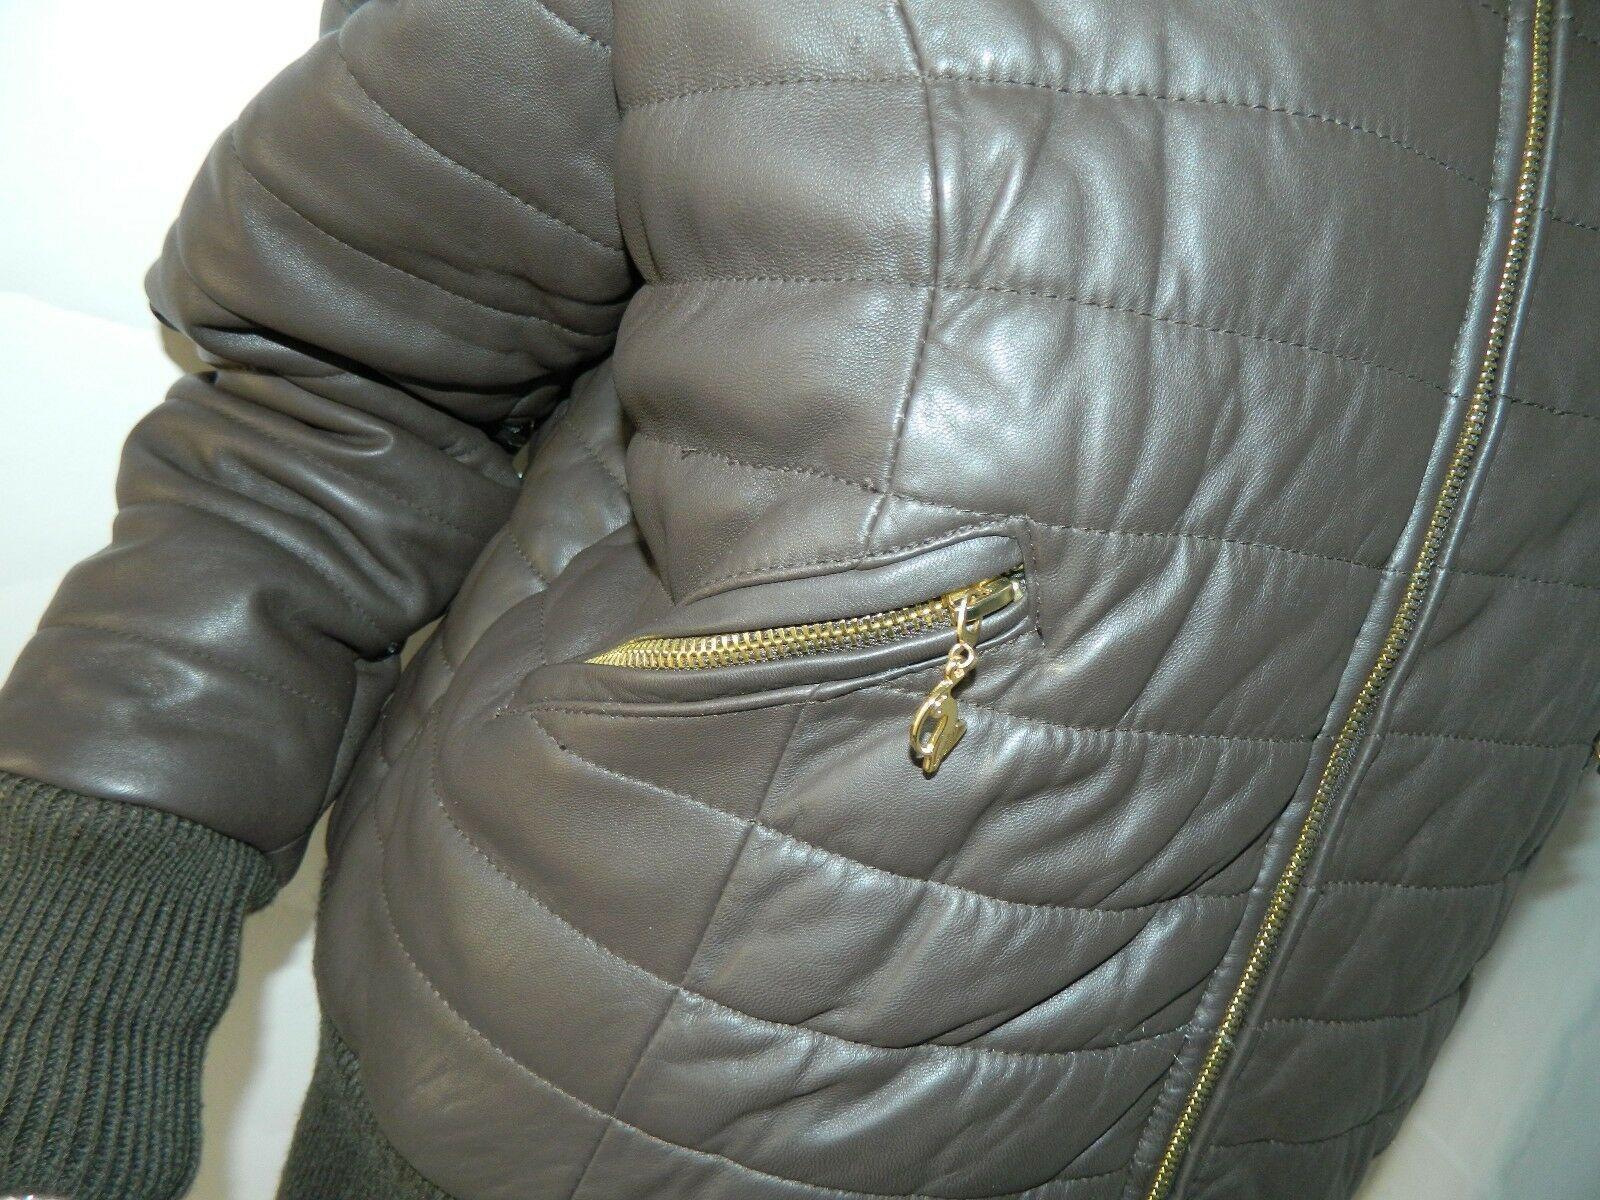 BABY PHAT Jacket Puffer Leather Kimora Lee Simmons Brown Coat XX-Large image 5